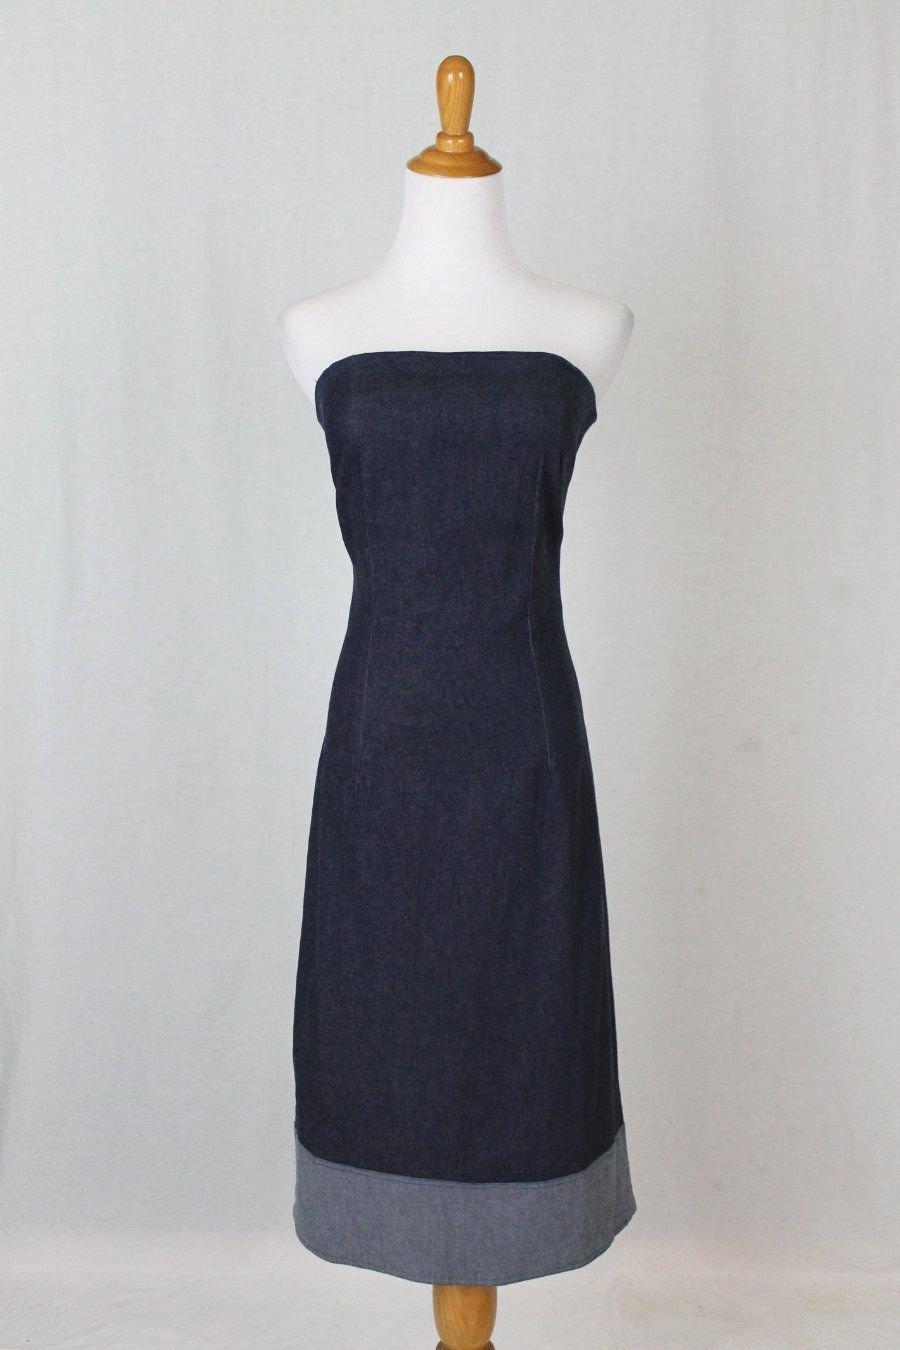 3B Made in America Strapless Dark Wash Stretch Denim Below the Knee dress M NEW